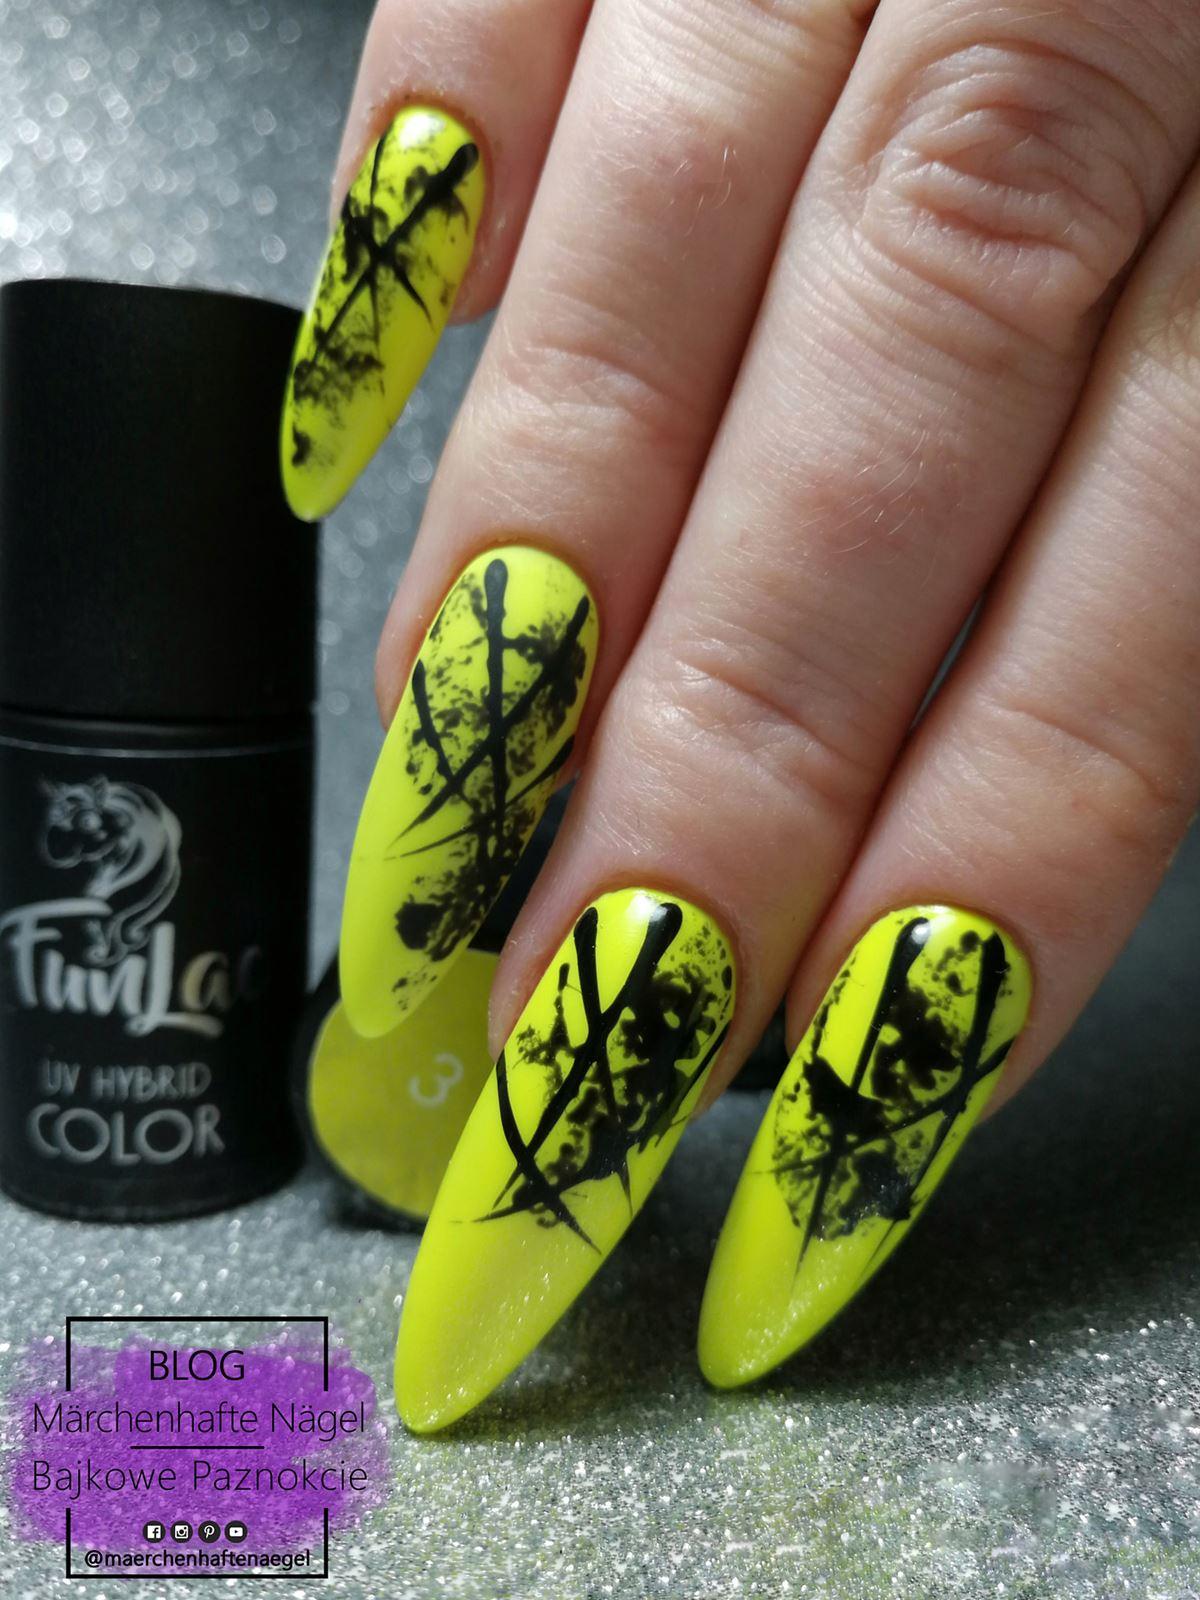 żółte neonowe paznokcie